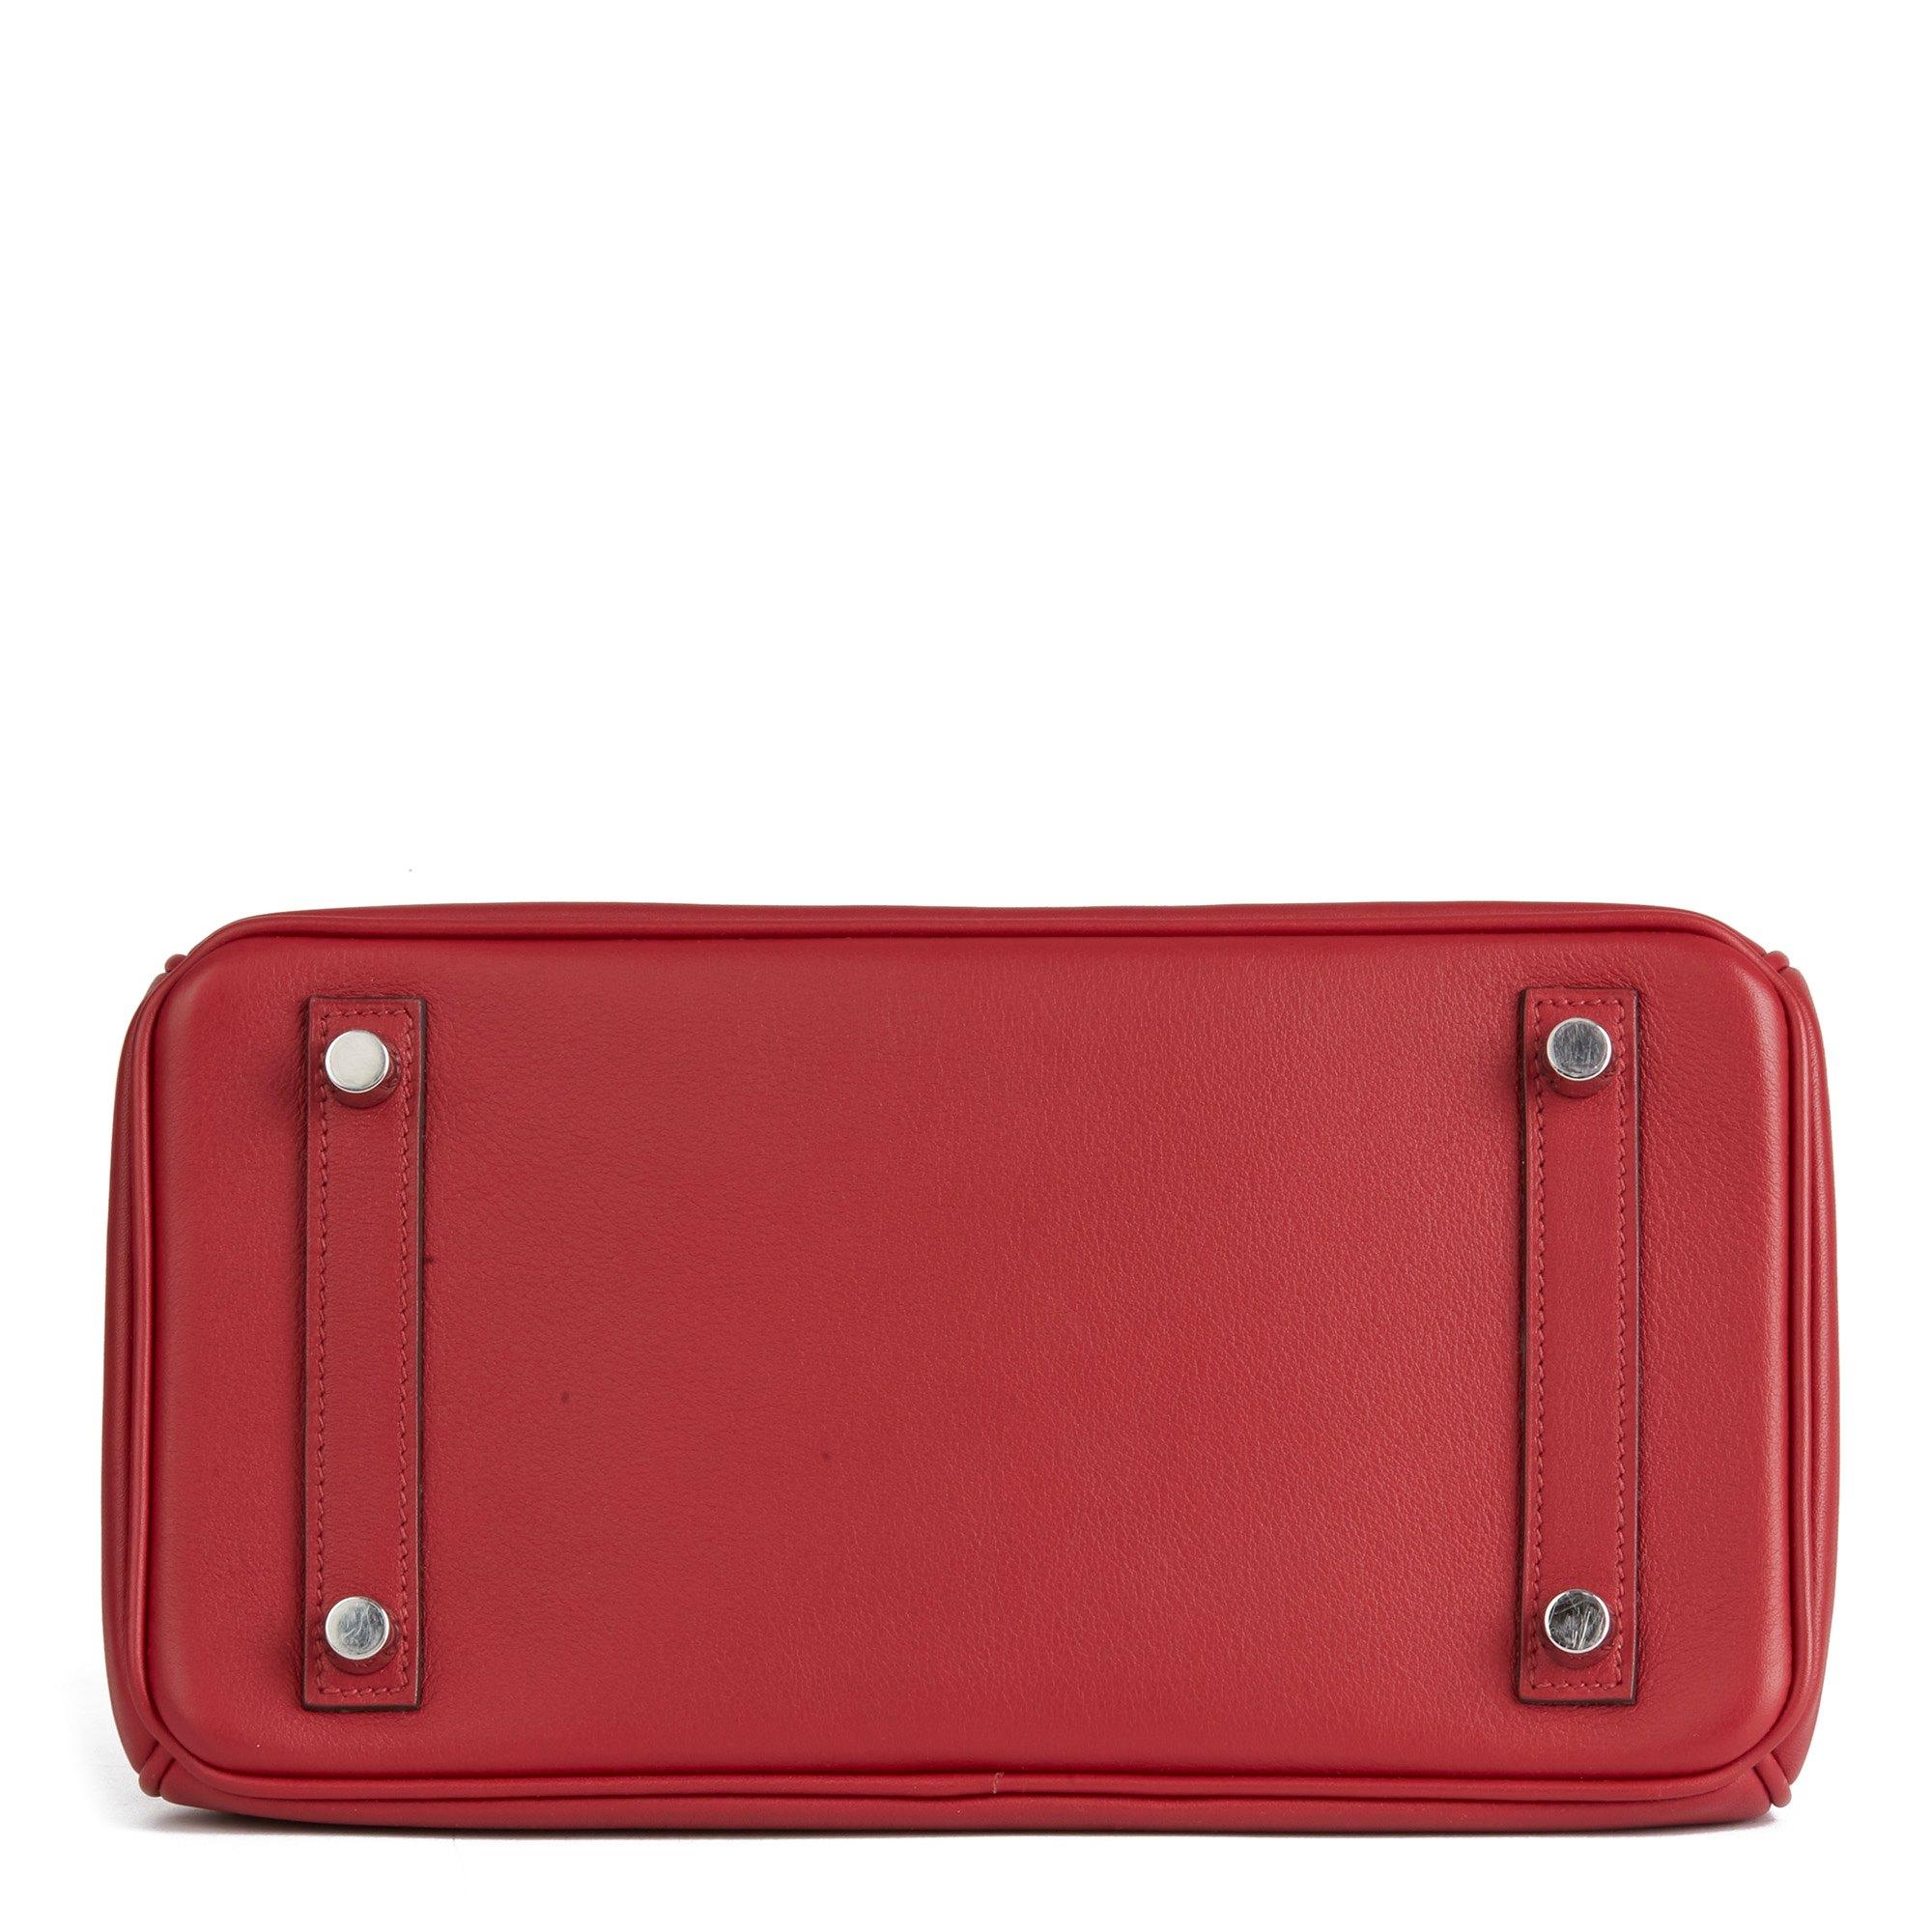 Hermès Rouge Grenat Swift Leather Birkin 25cm